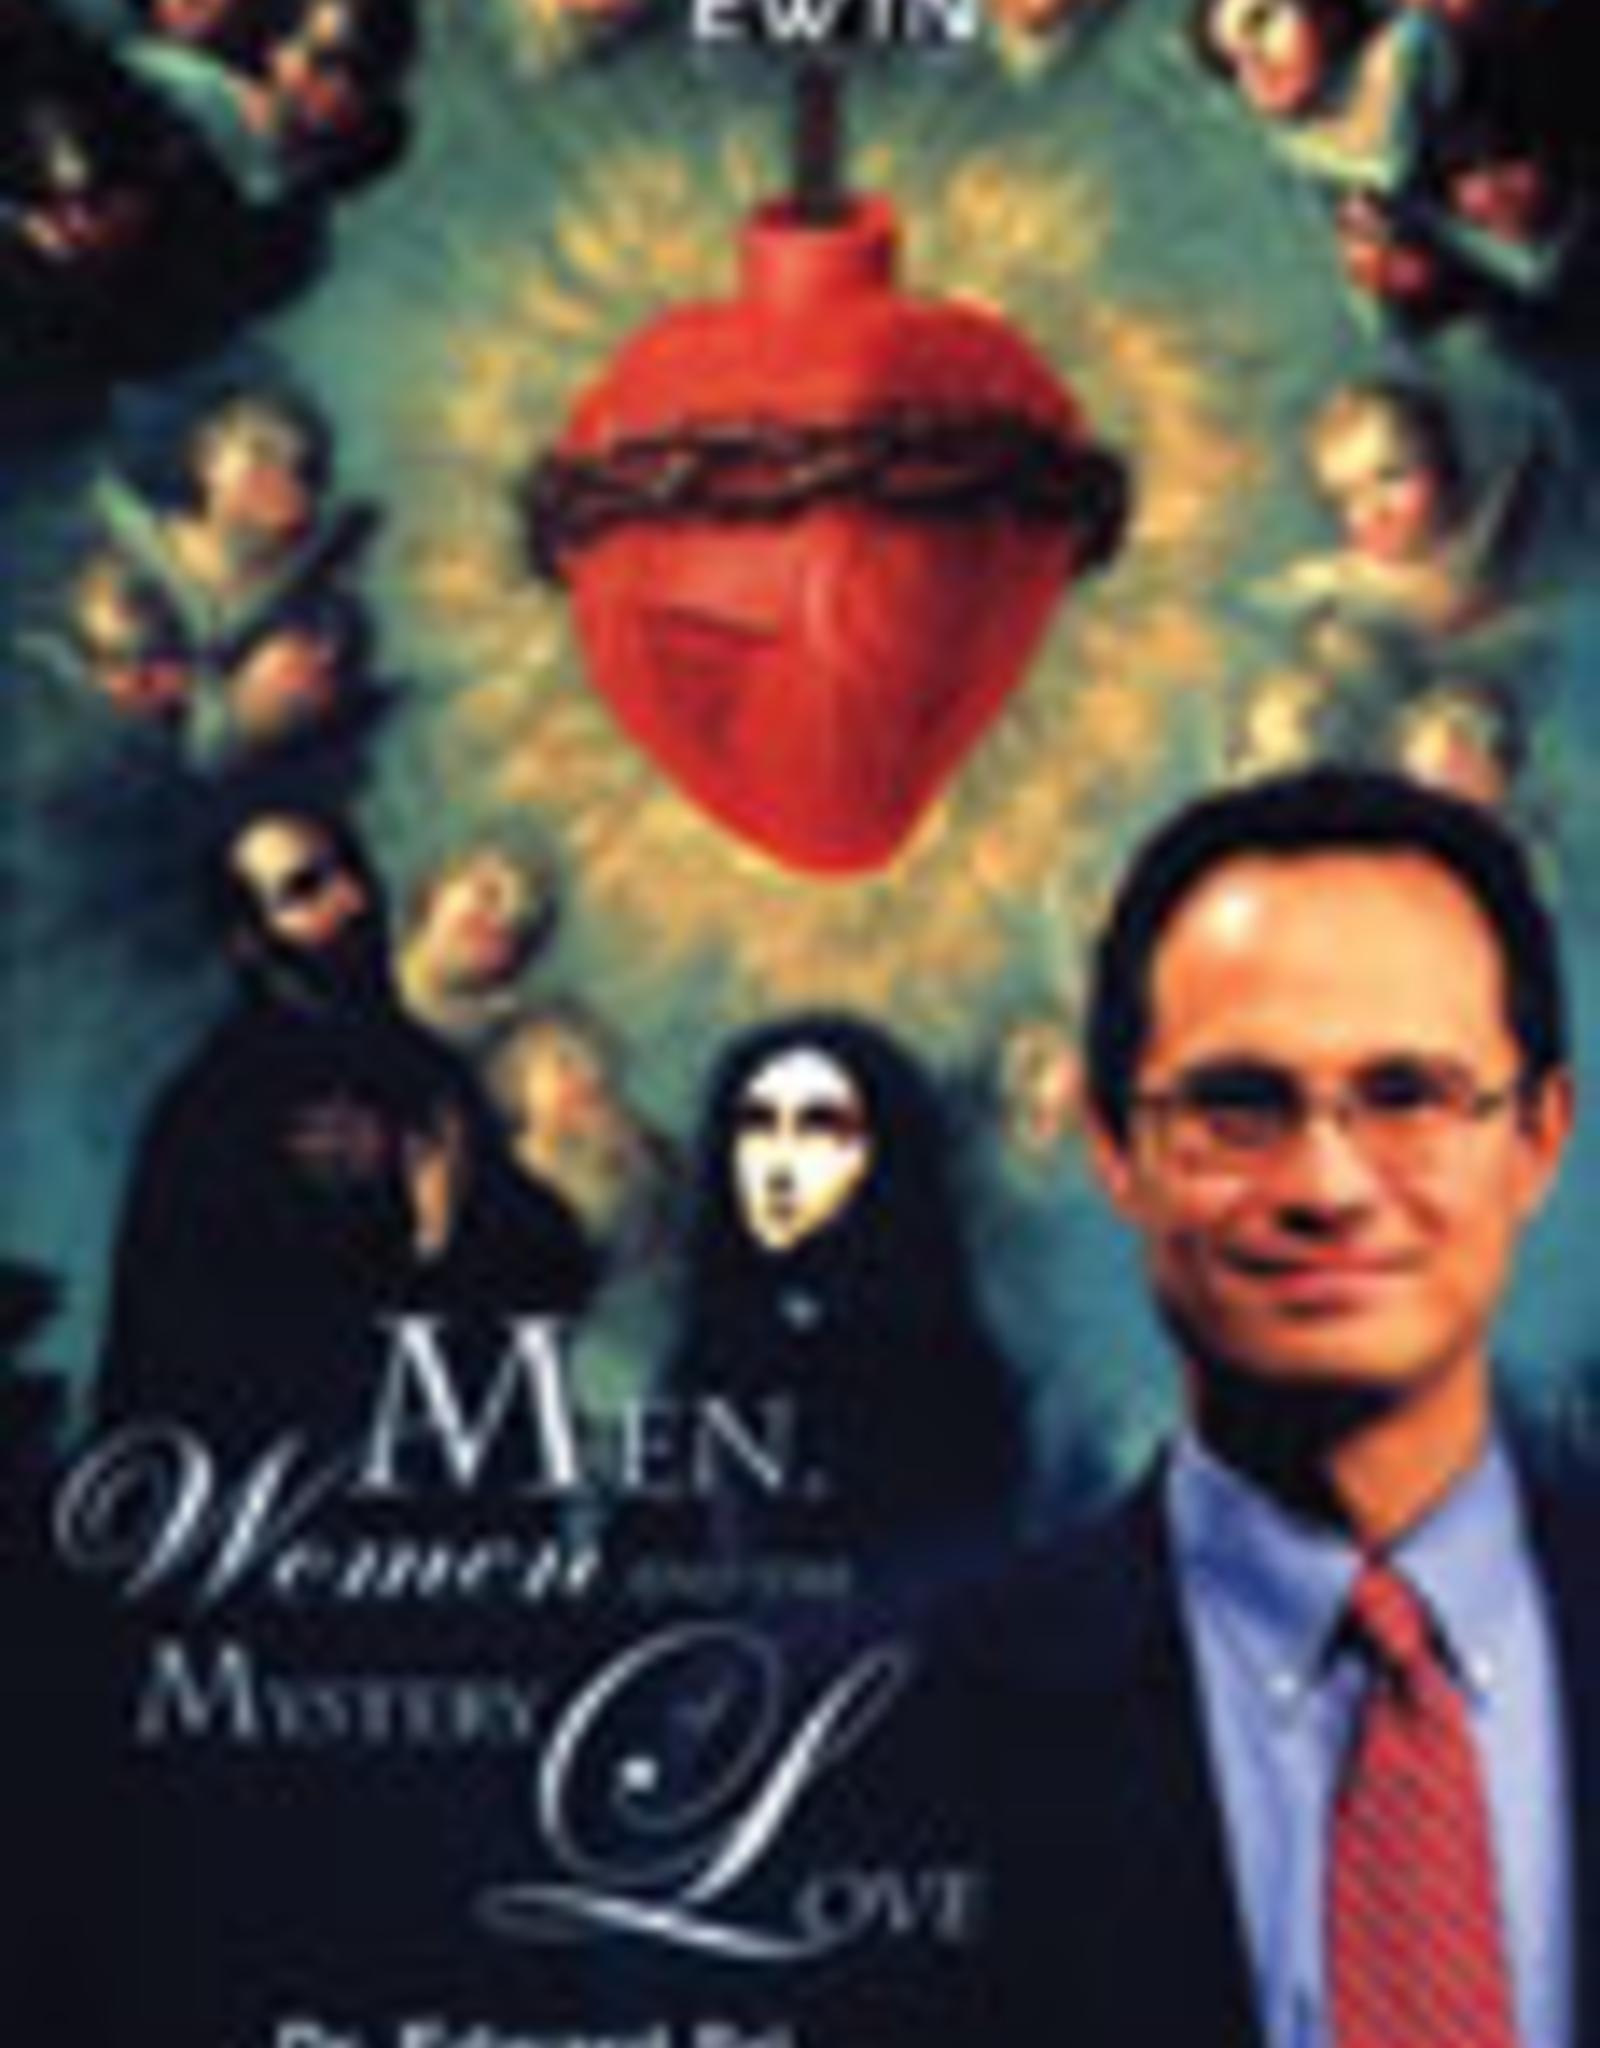 Ignatius Press Men, Women and the Mystery of Love (DVD)